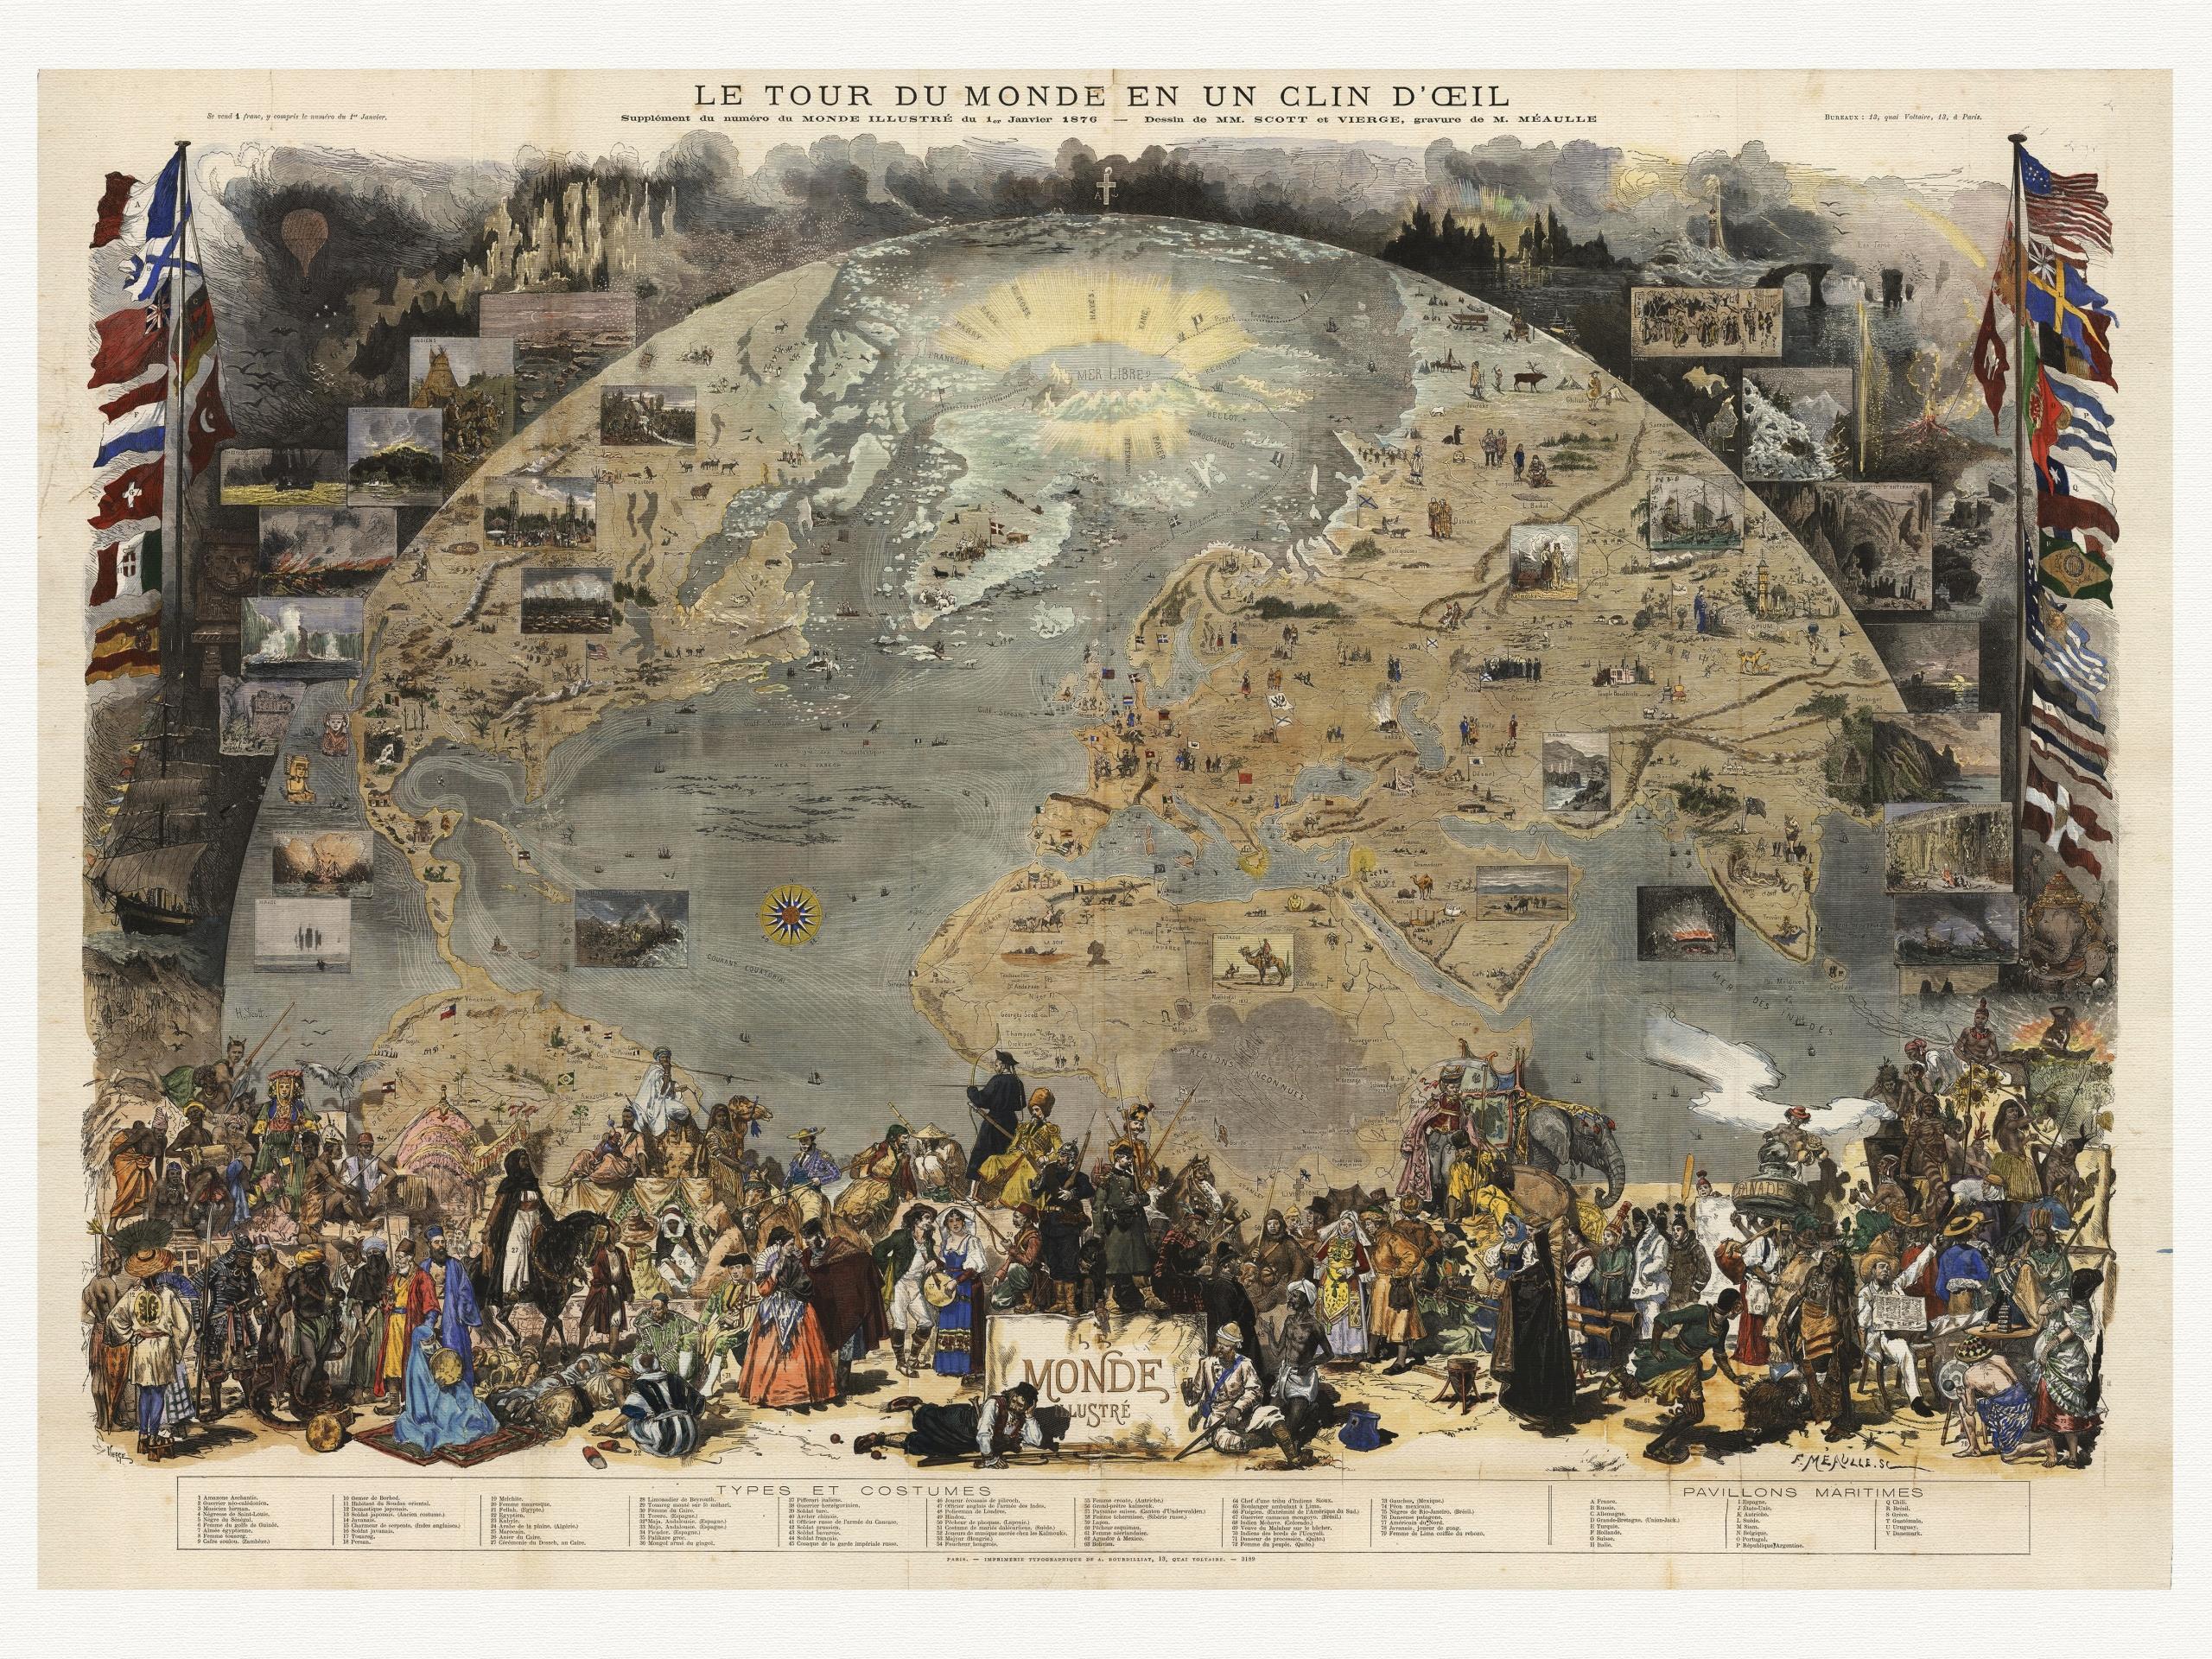 Item Map of the World, SCOTT 1876 canvas